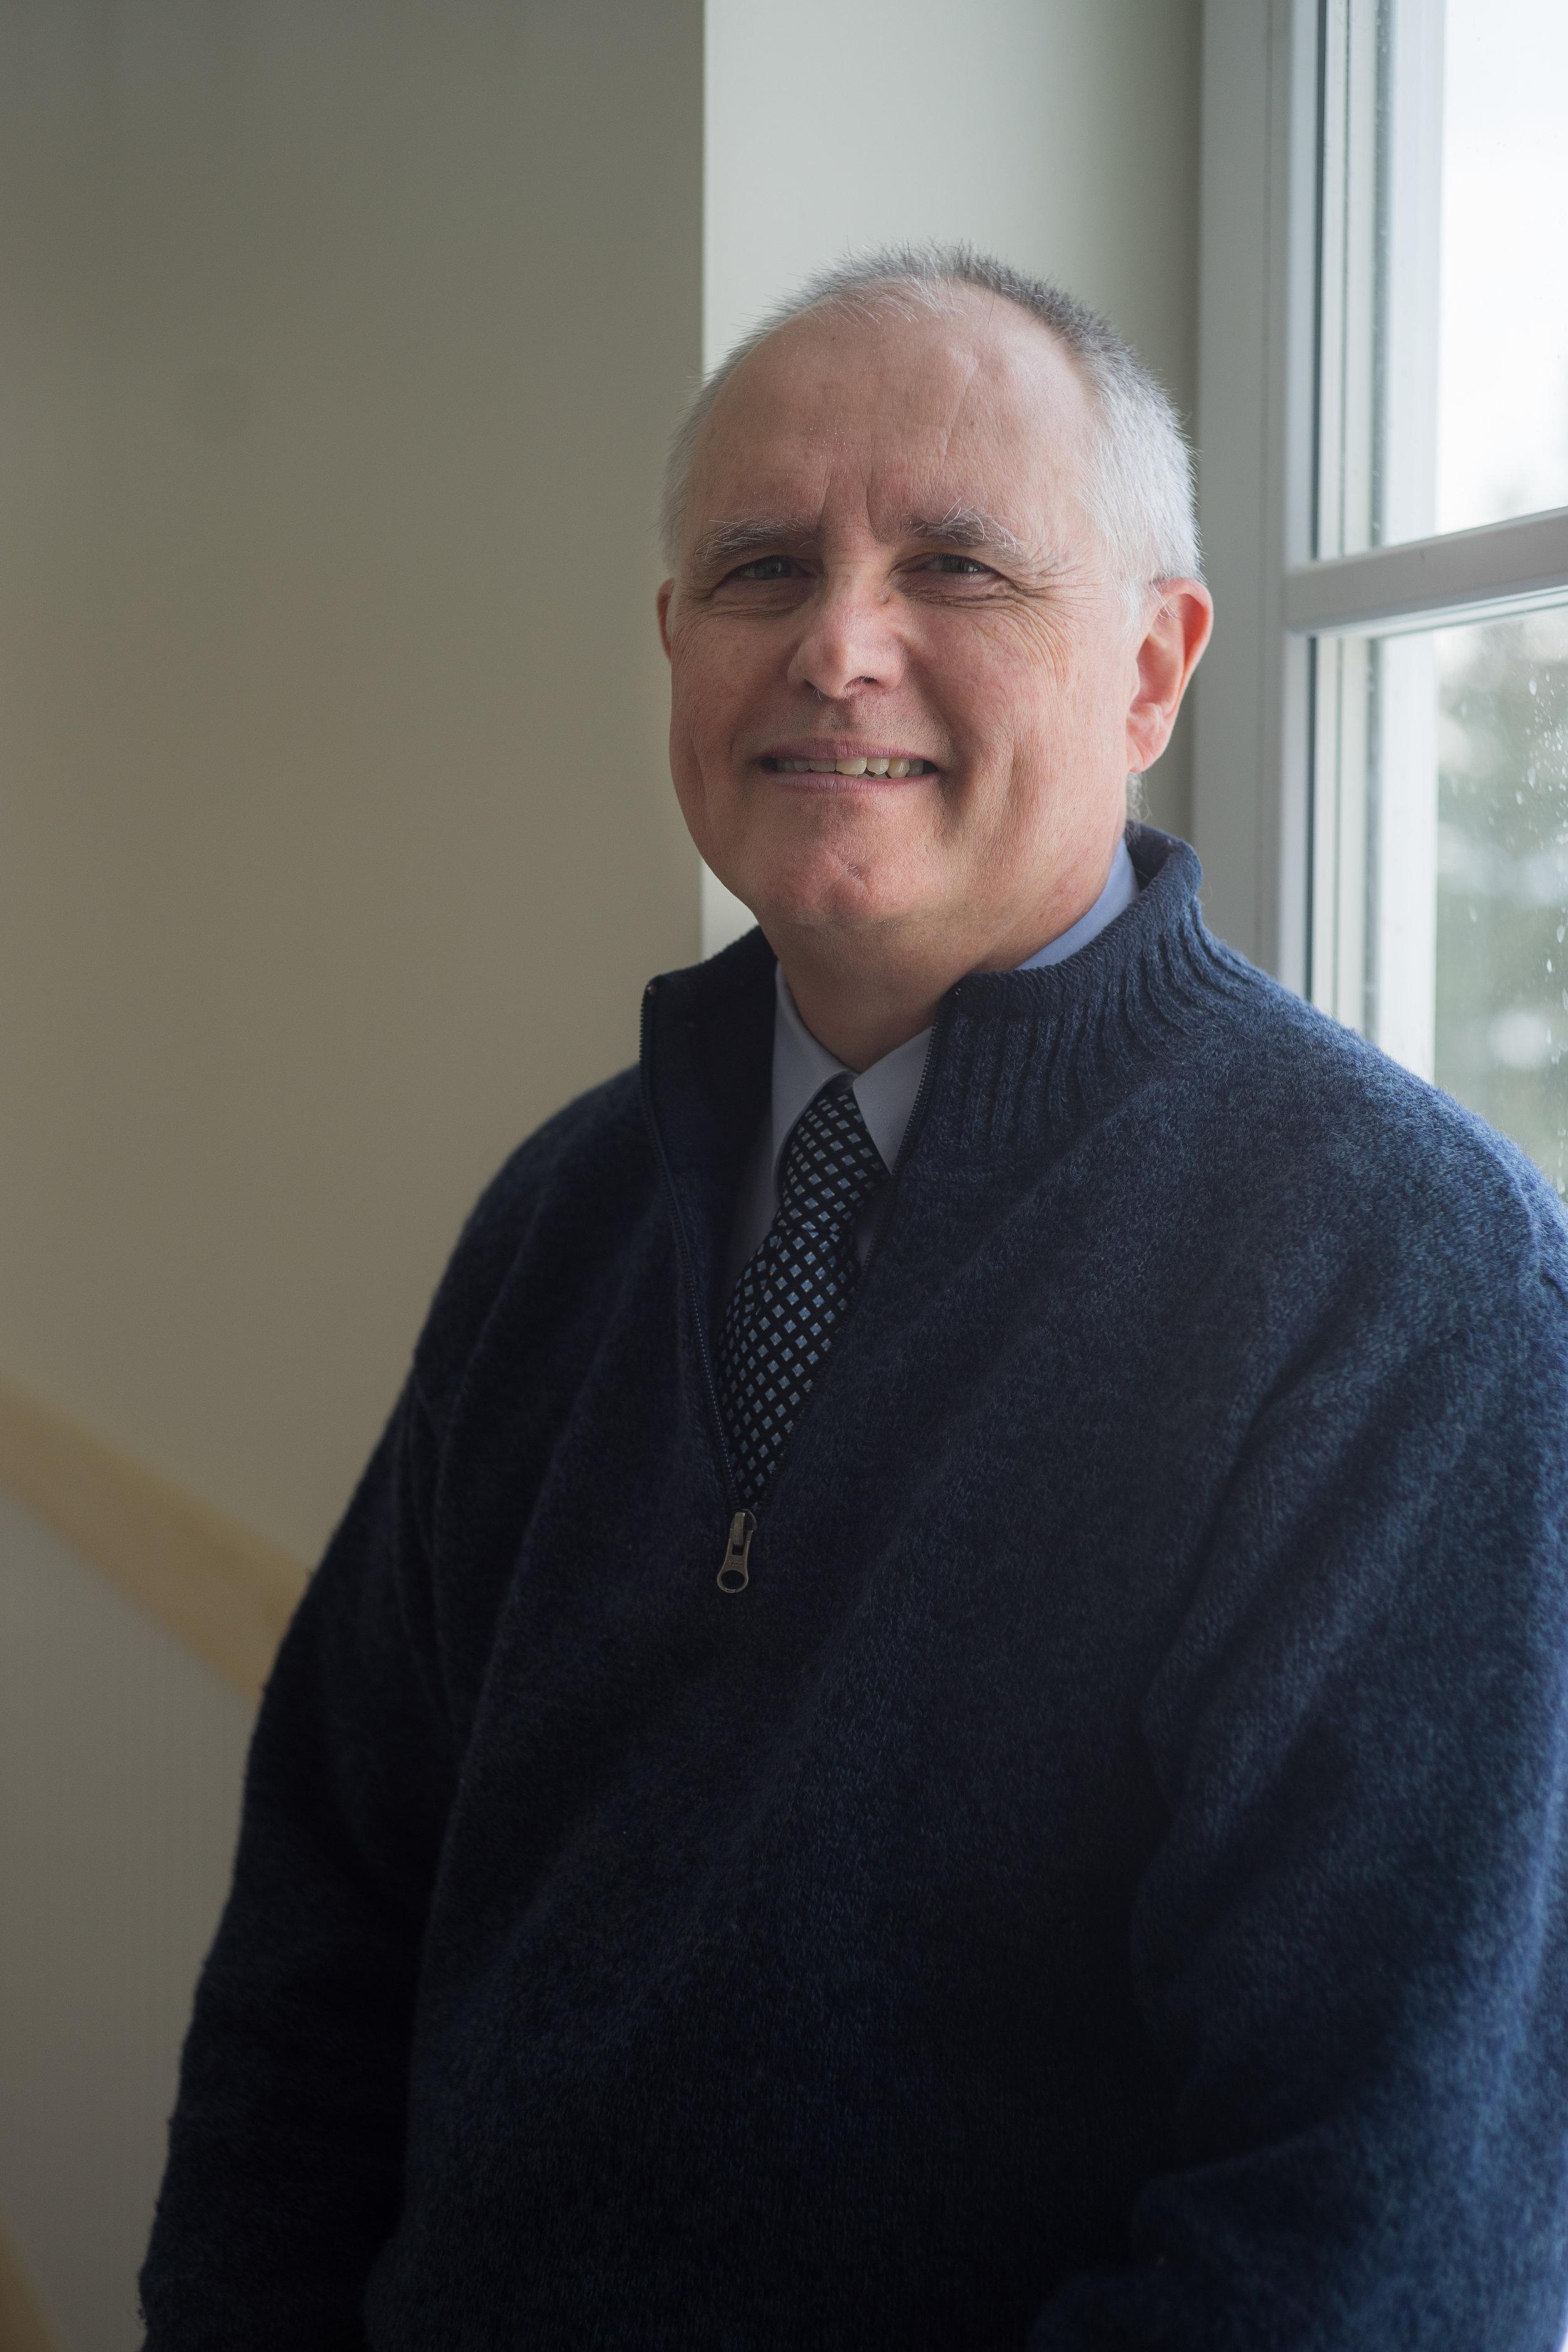 Dave Macy, Vice President